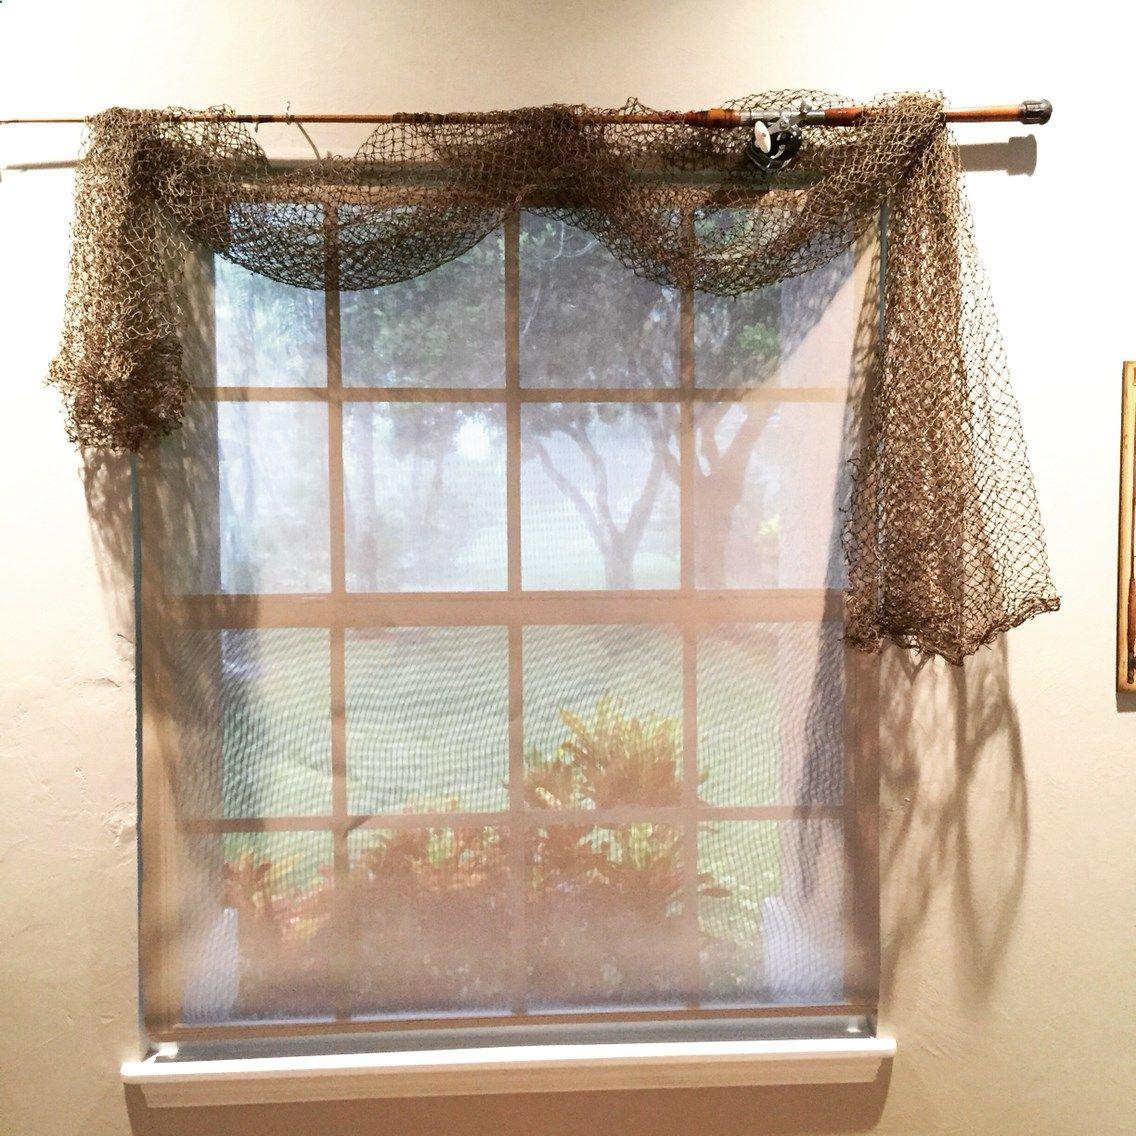 Fishing pole curtain rod fish net curtains fishing bedroom decor